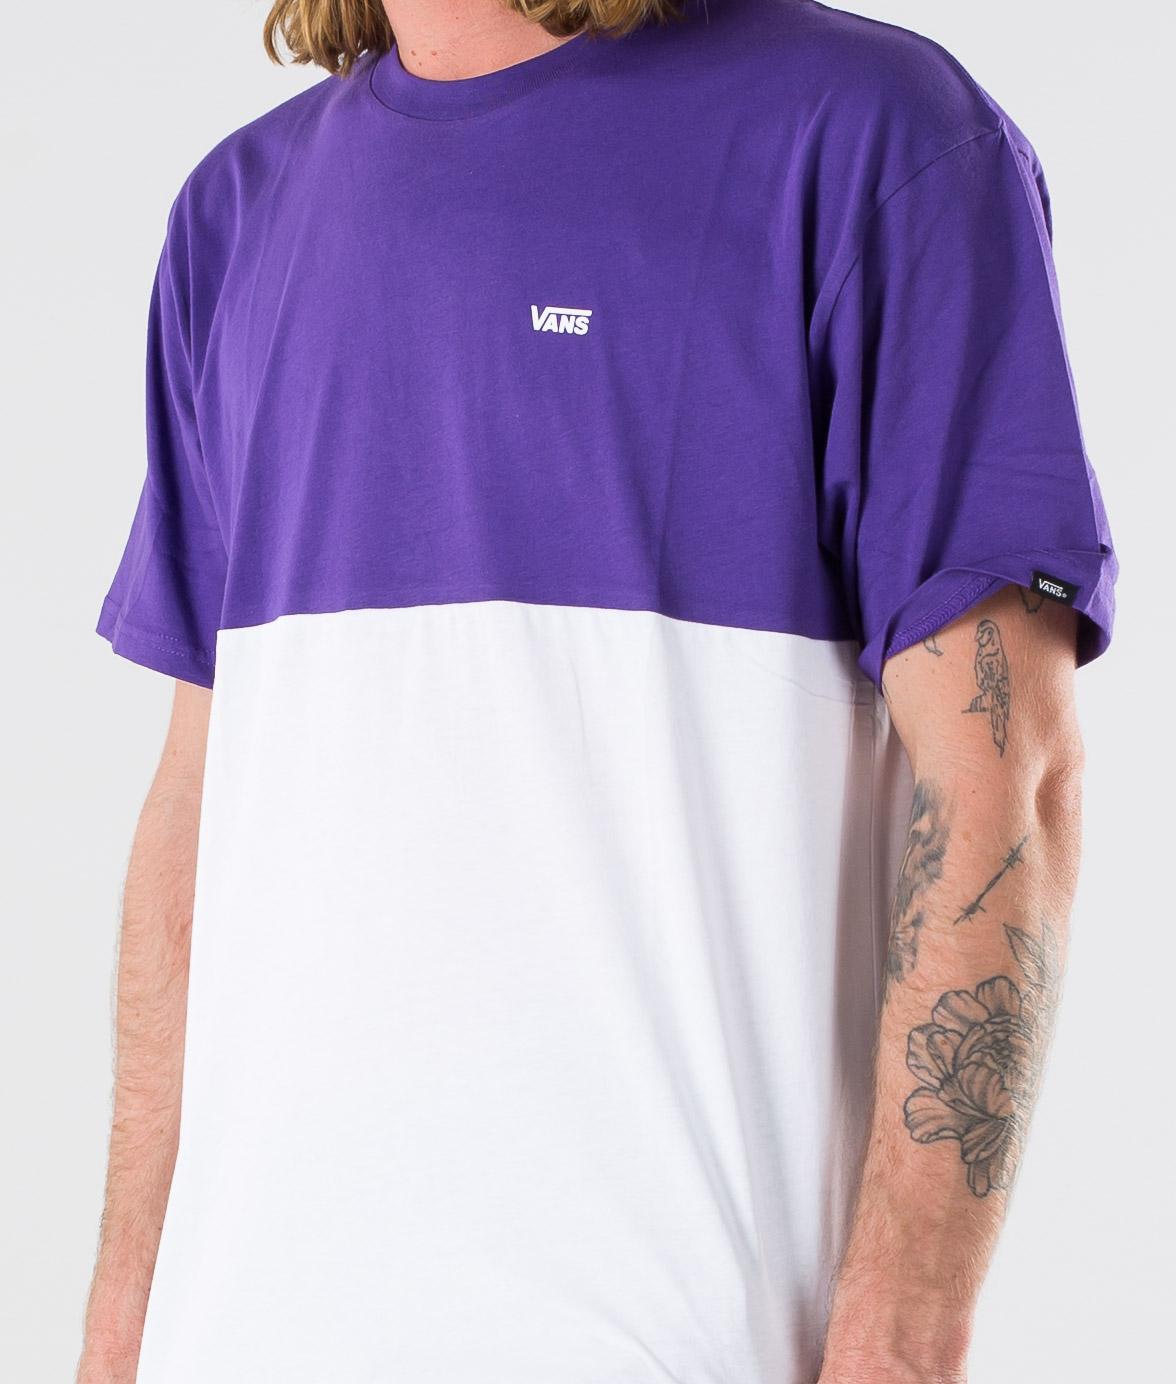 Vans Colorblock Tee T shirt WhiteHeliotrope